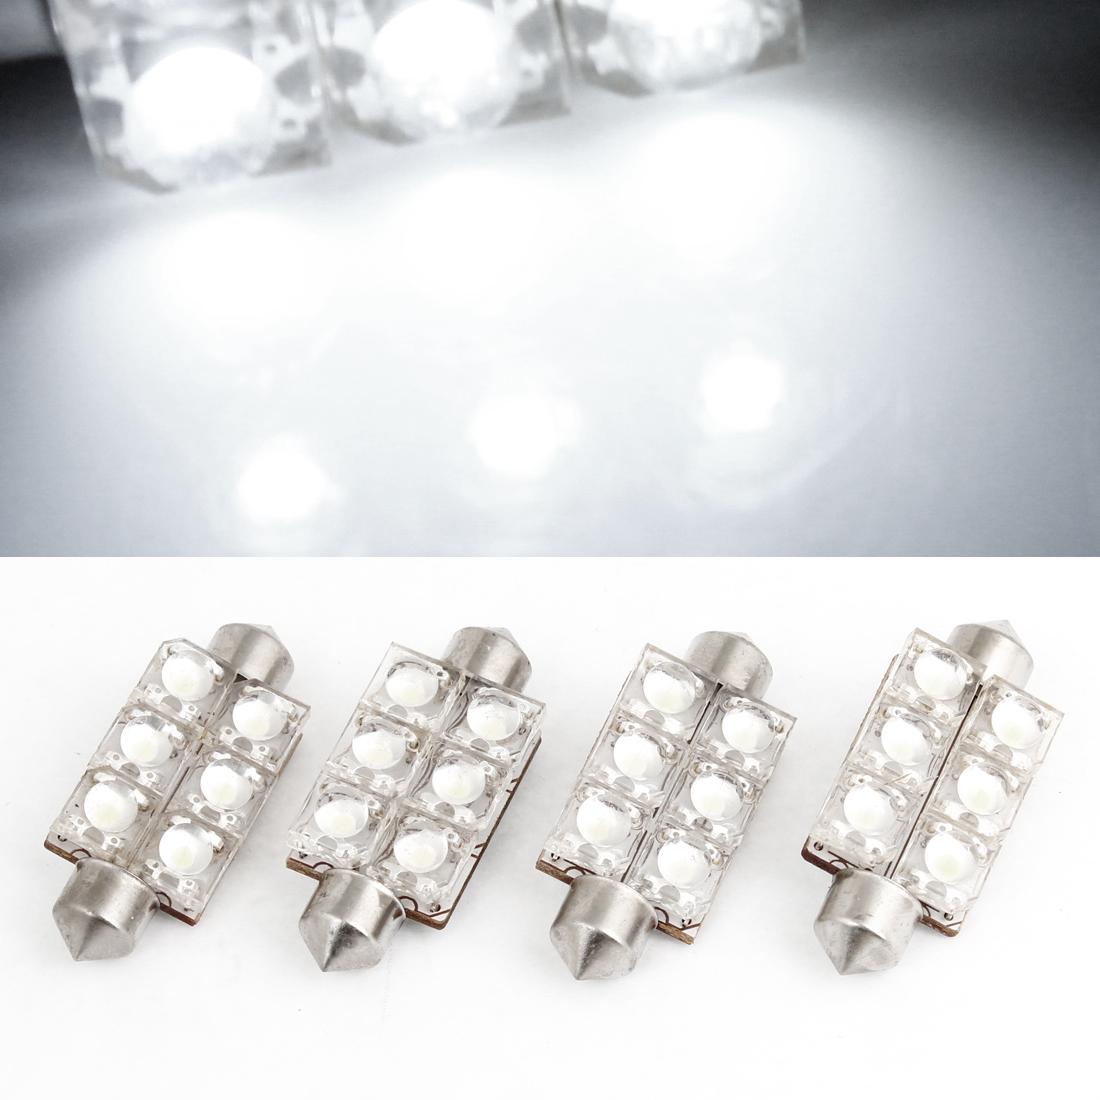 4PCS 41mm White 6 LED Festoon Light Bulb for Auto Interior Dome Lamp